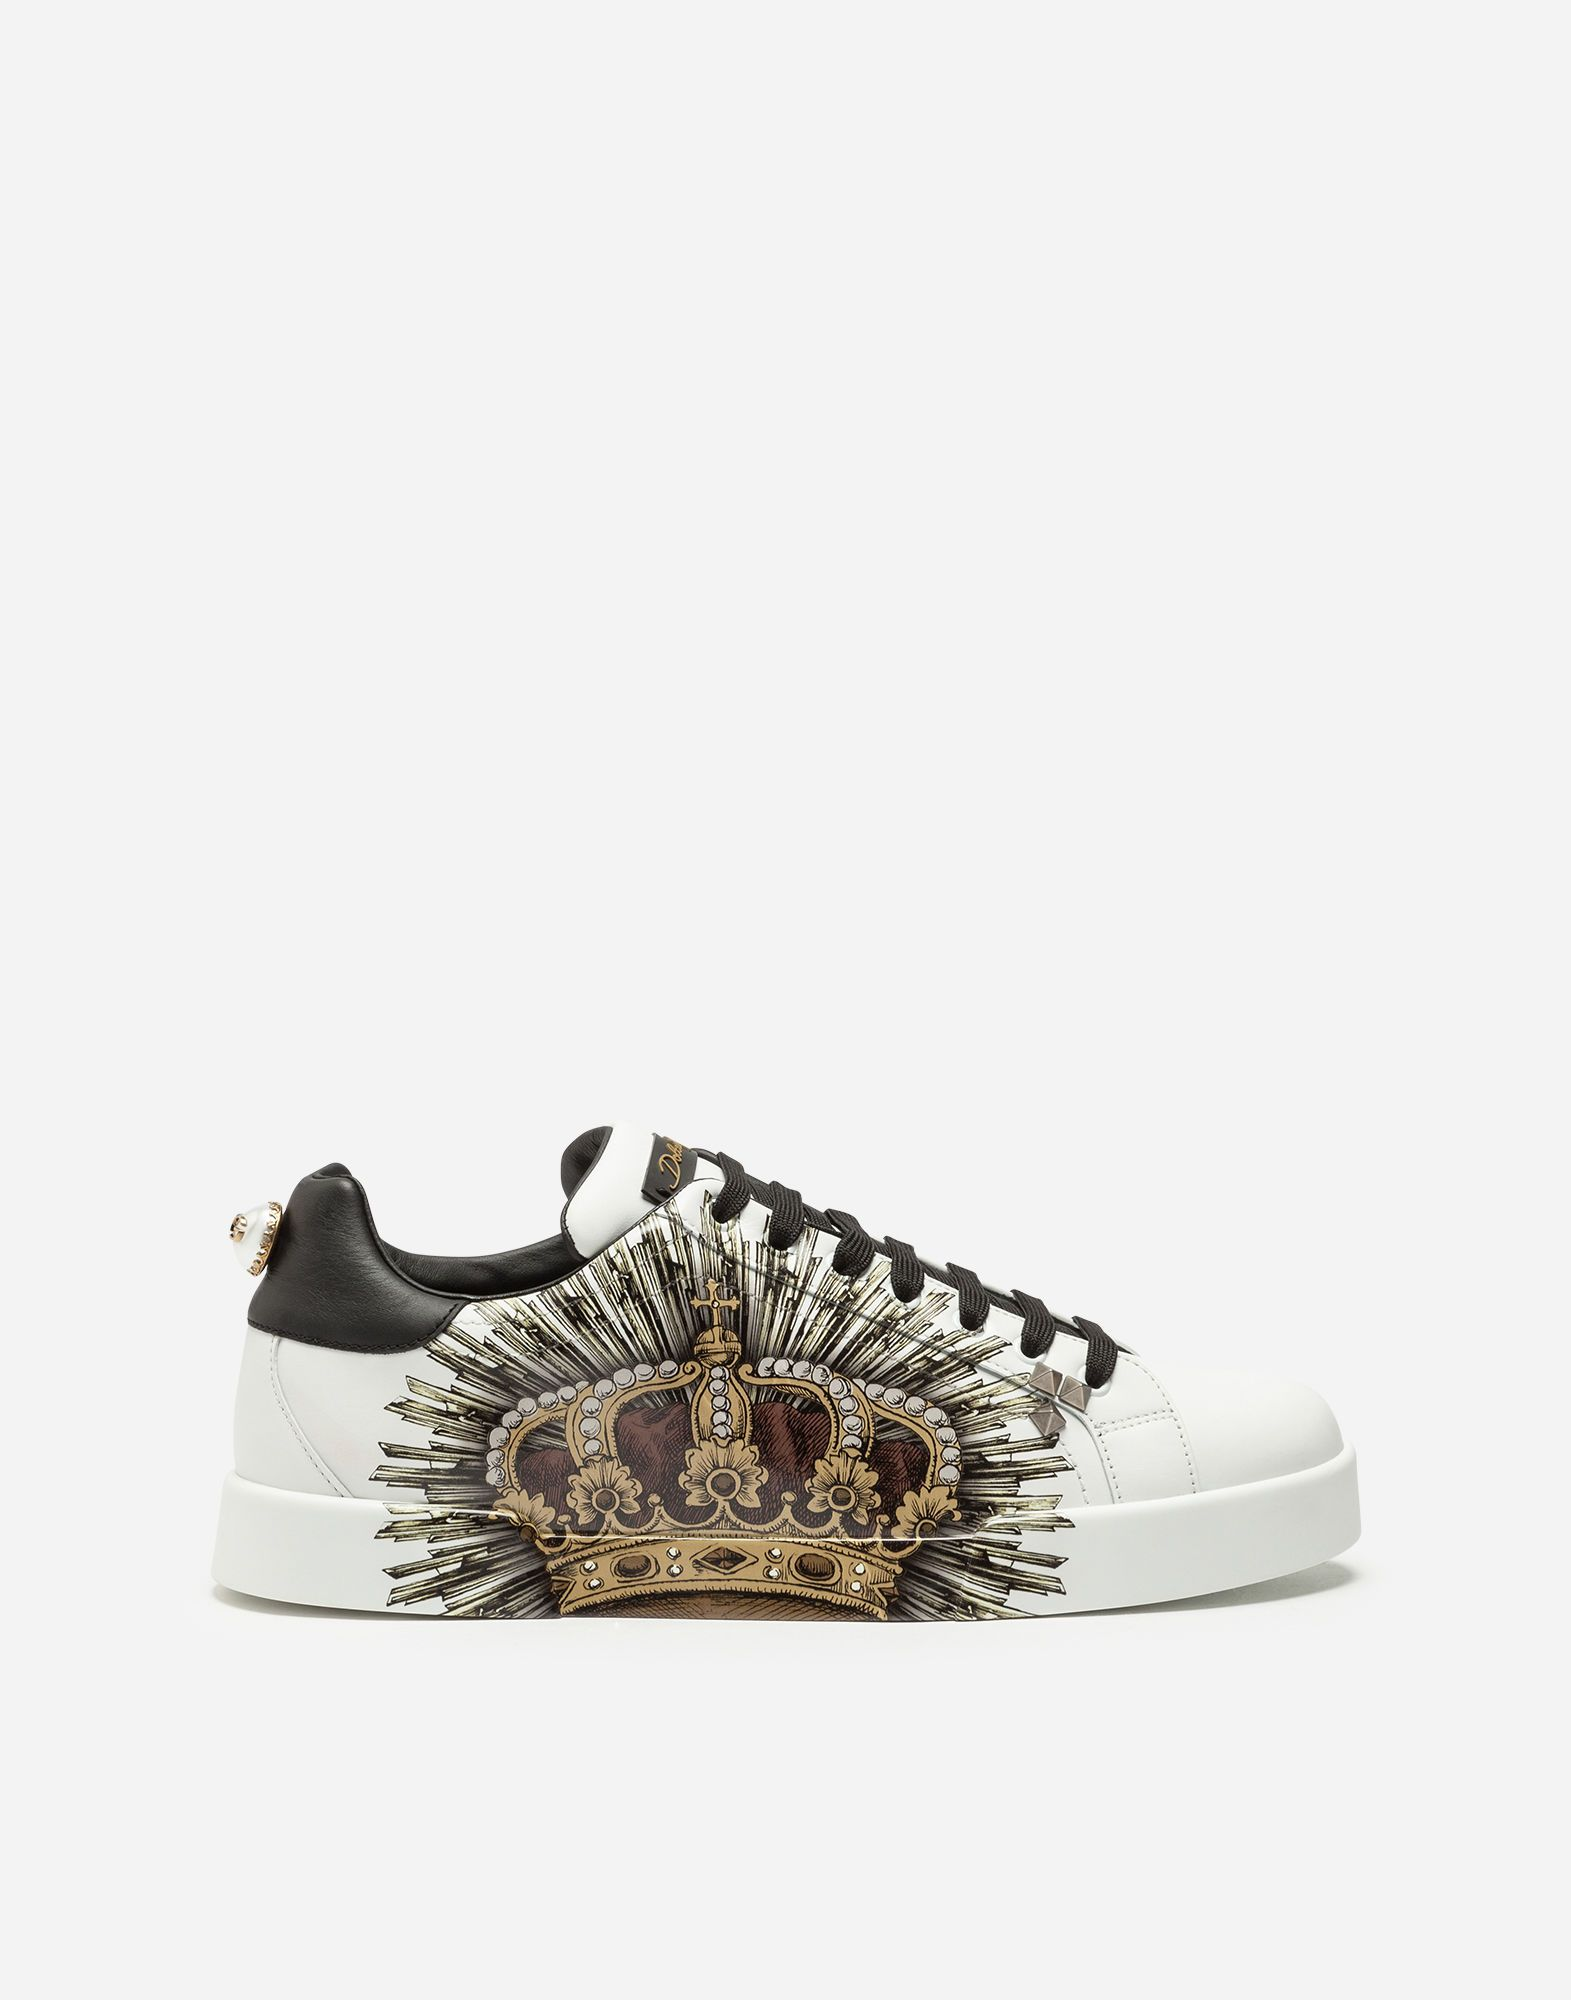 DOLCE   GABBANA PORTOFINO SNEAKERS IN PRINTED CALFSKIN.  dolcegabbana  shoes    21c7c7b839e8